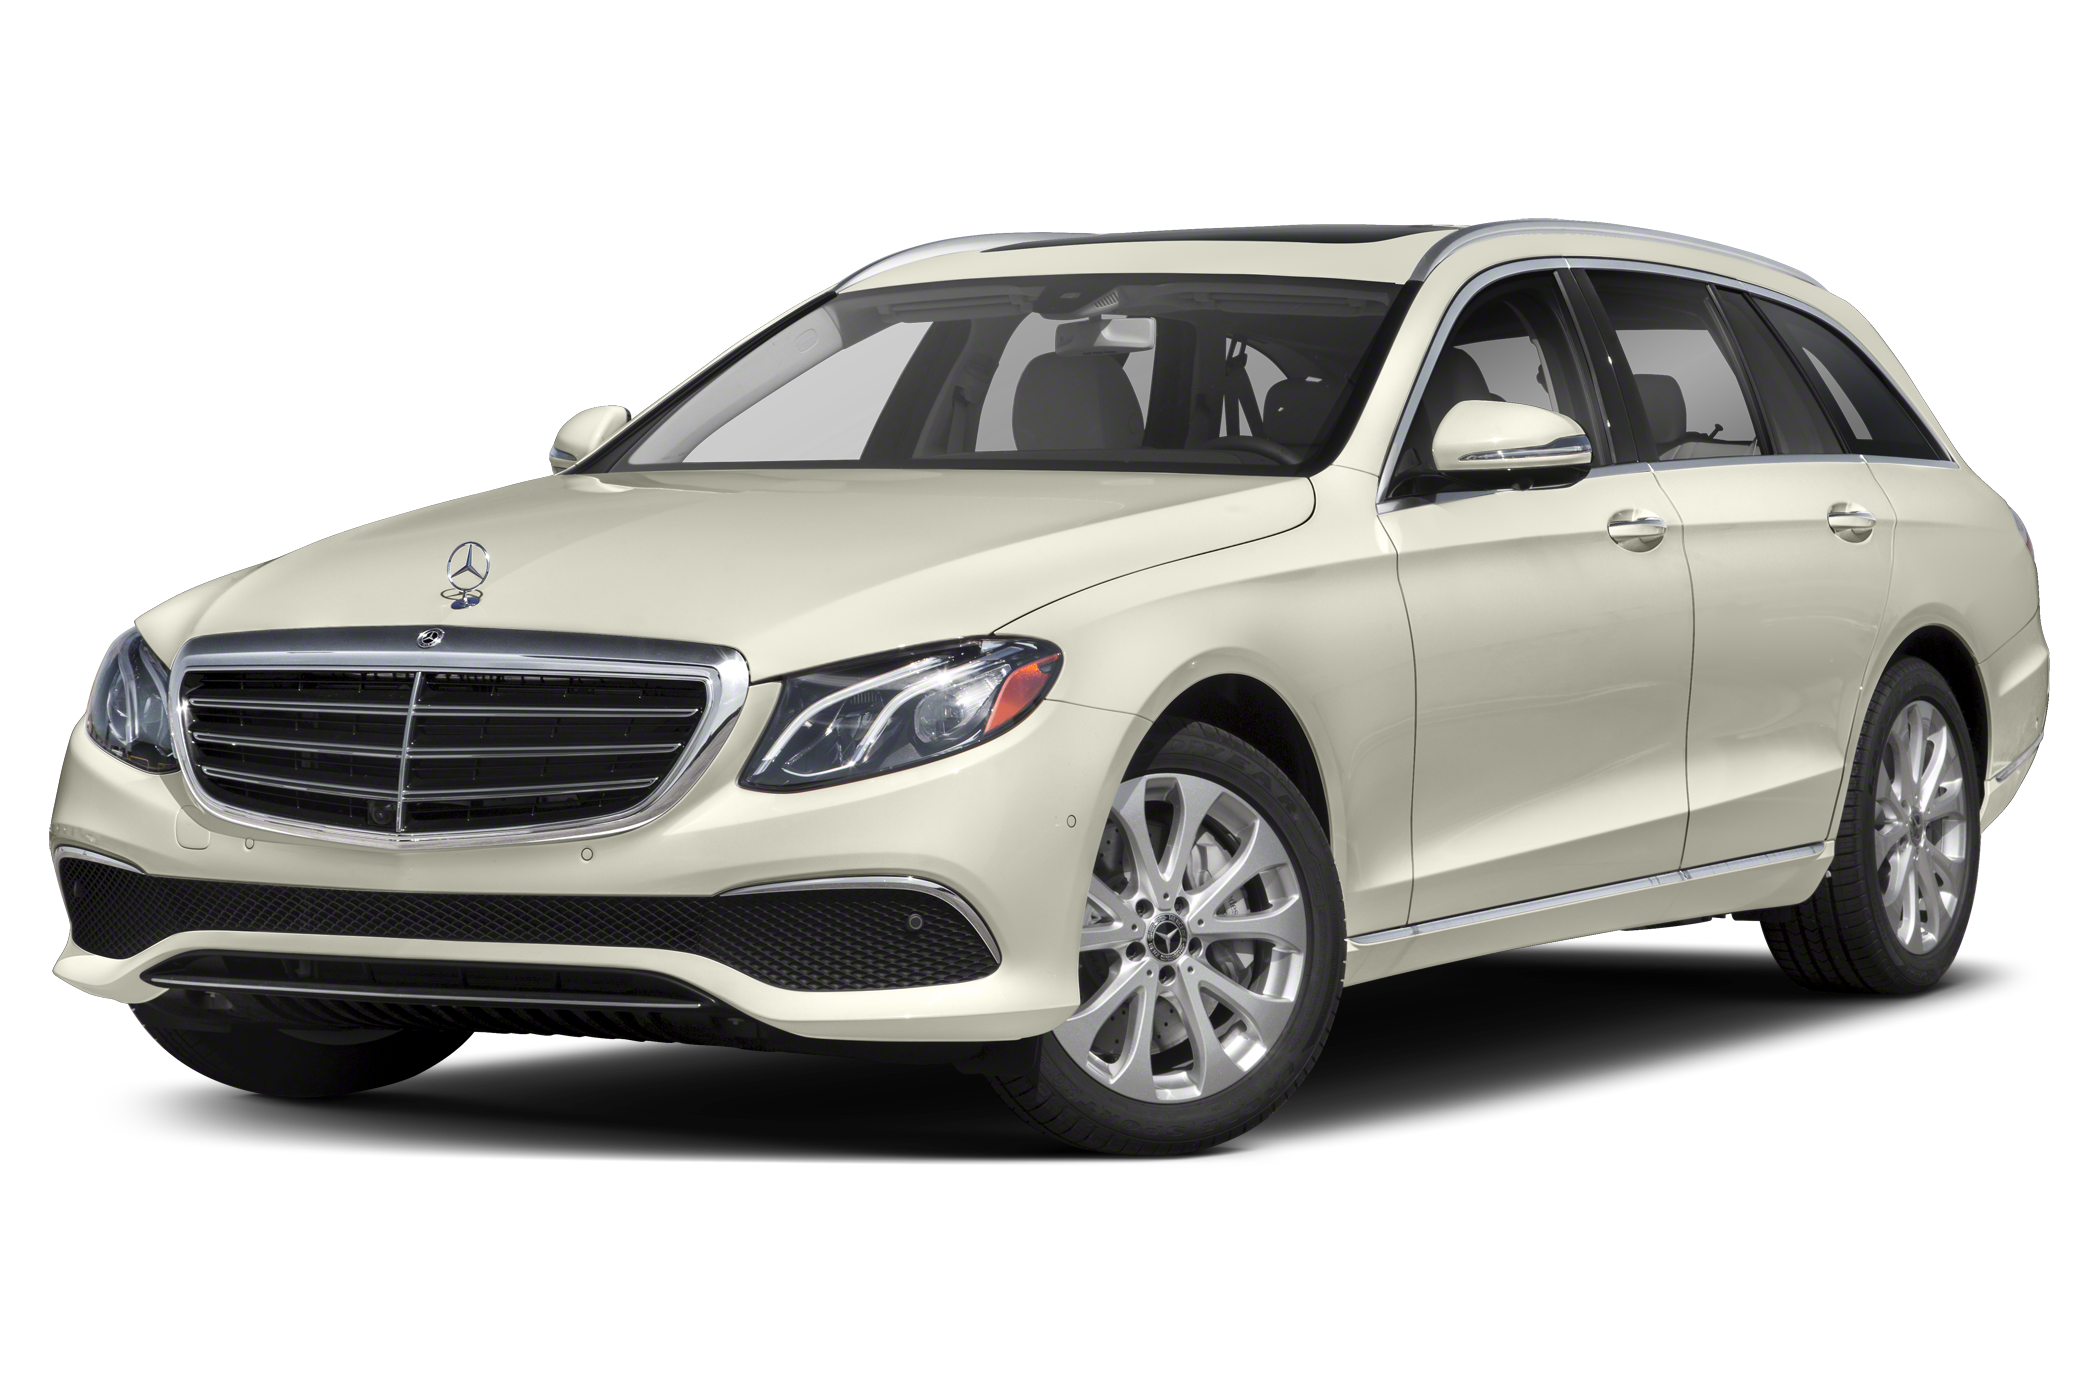 pare Mercedes benz E class to Mercedes benz S class